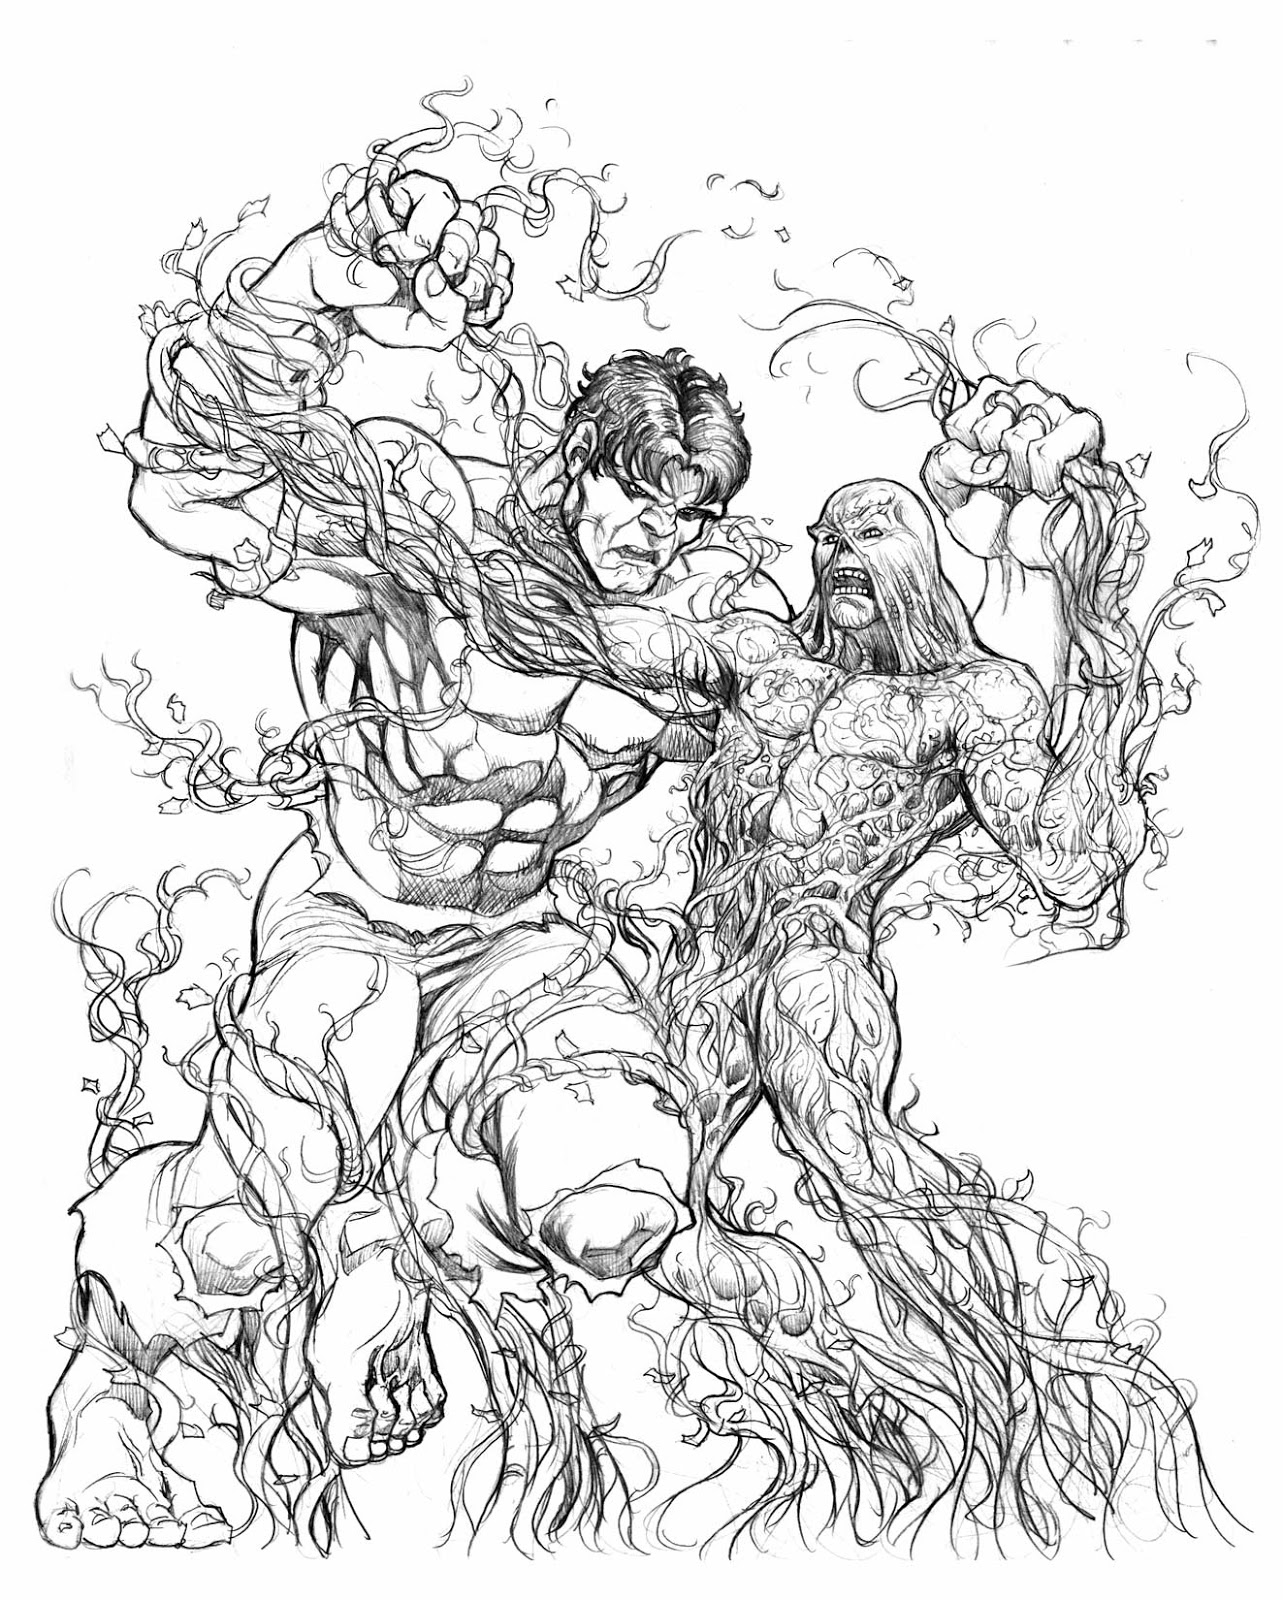 Lee Oaks: The Covers: The Hulk vs. Swampthing